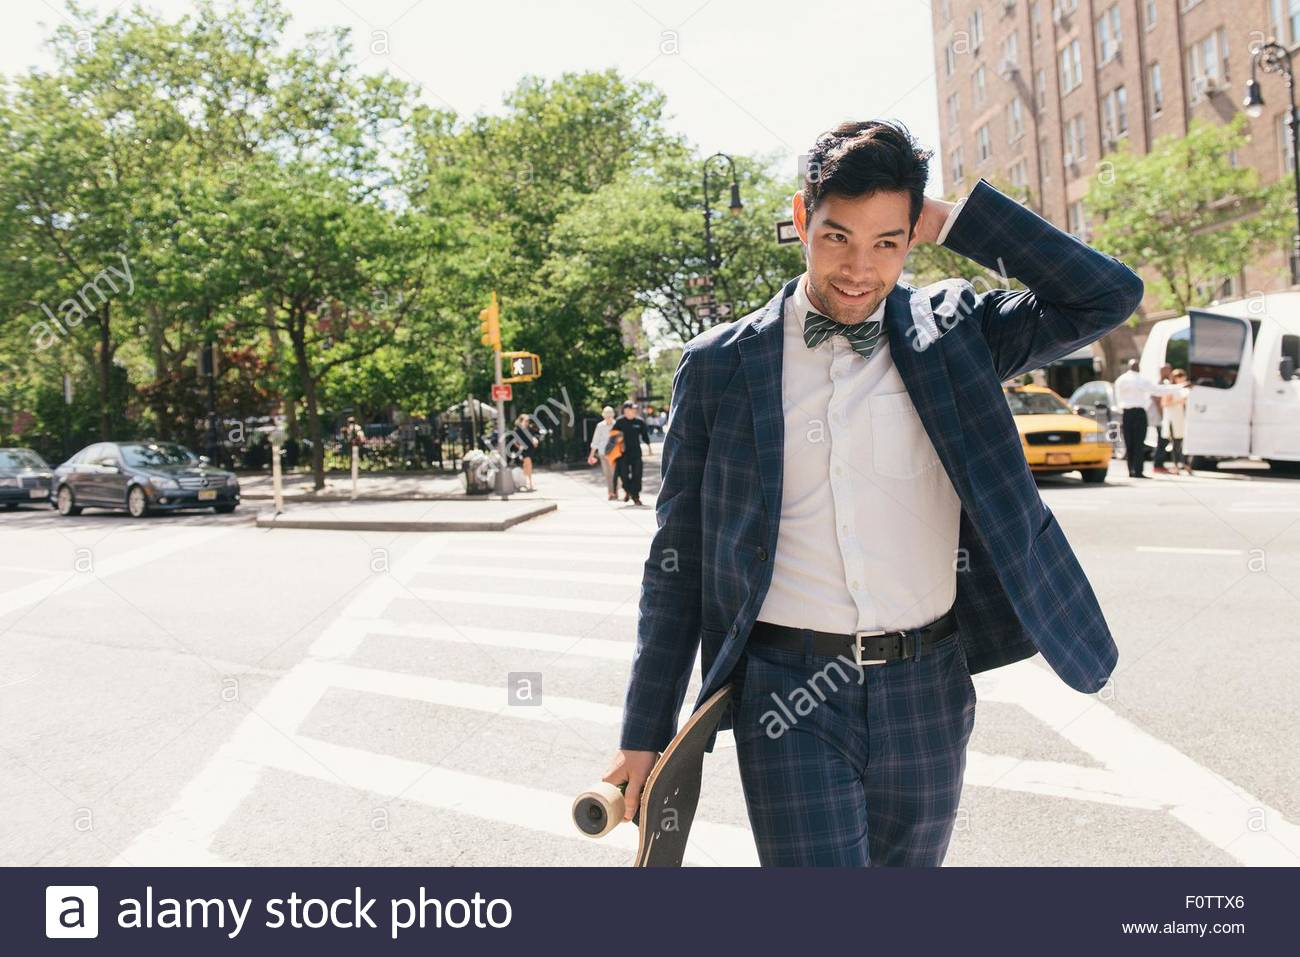 Suit wearing male skateboarder crossing road, West Village, Manhattan, USA - Stock Image